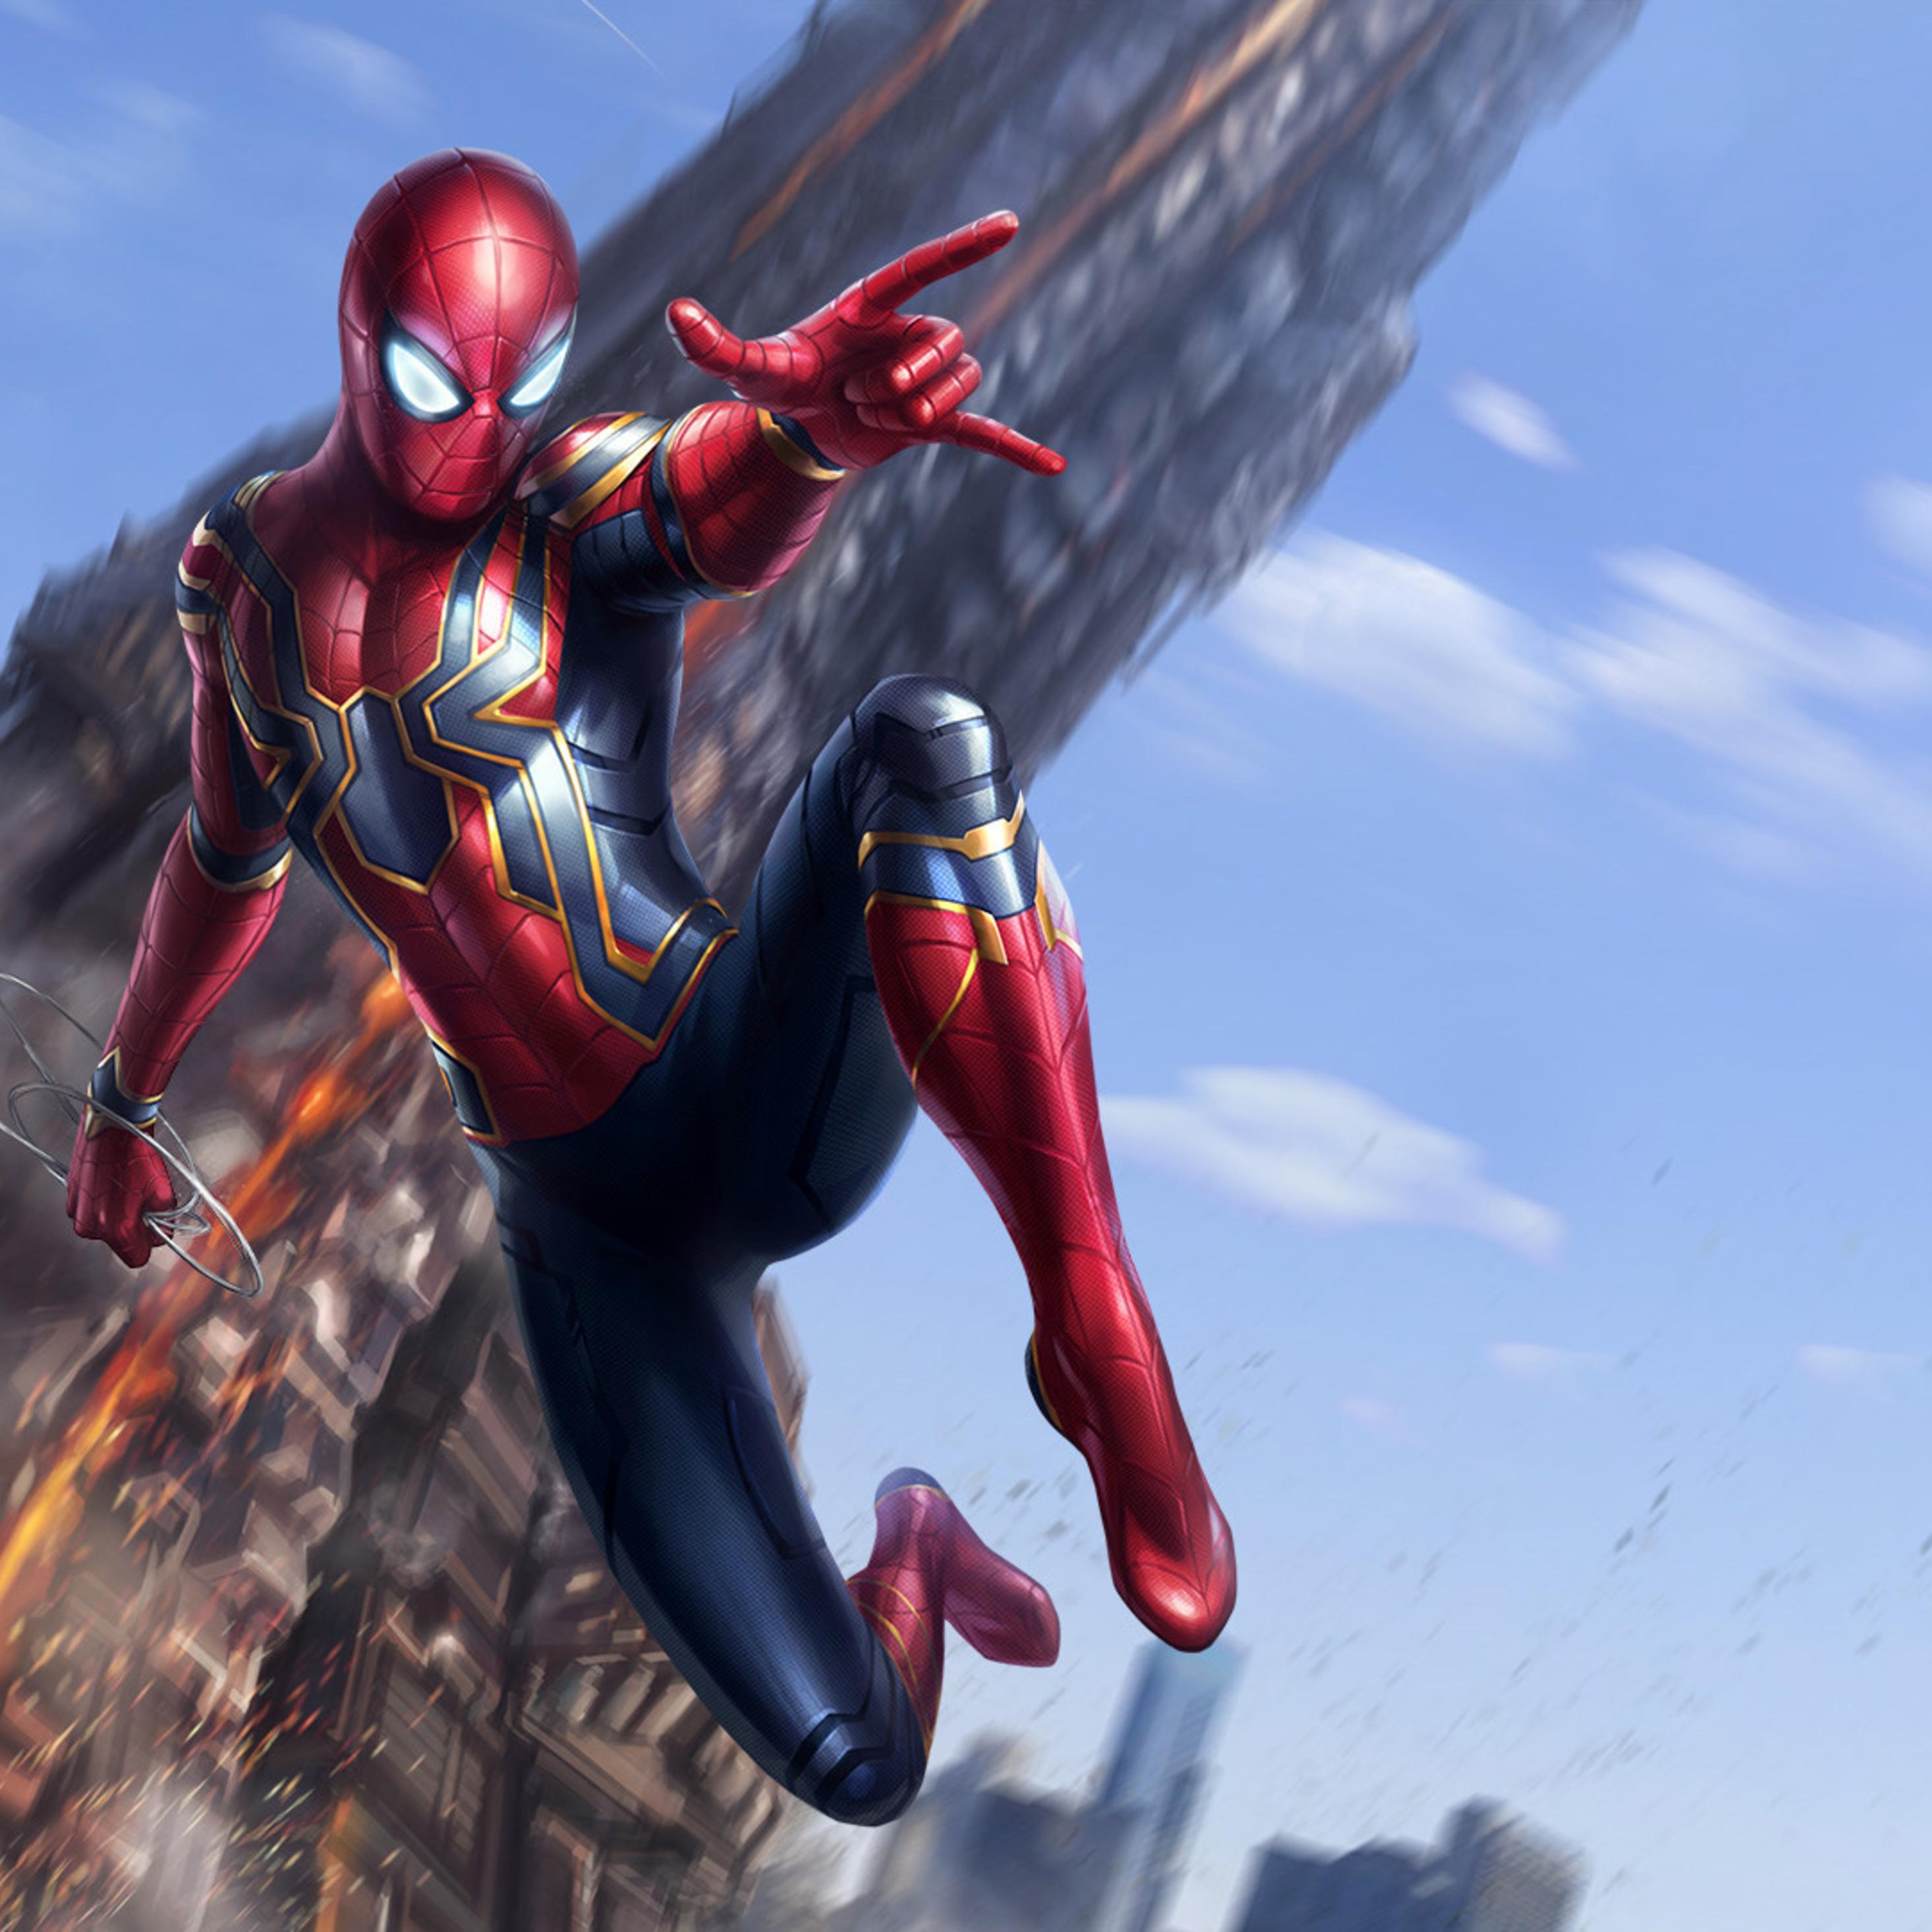 2932x2932 Spiderman Avengers Infinity War Art Ipad Pro